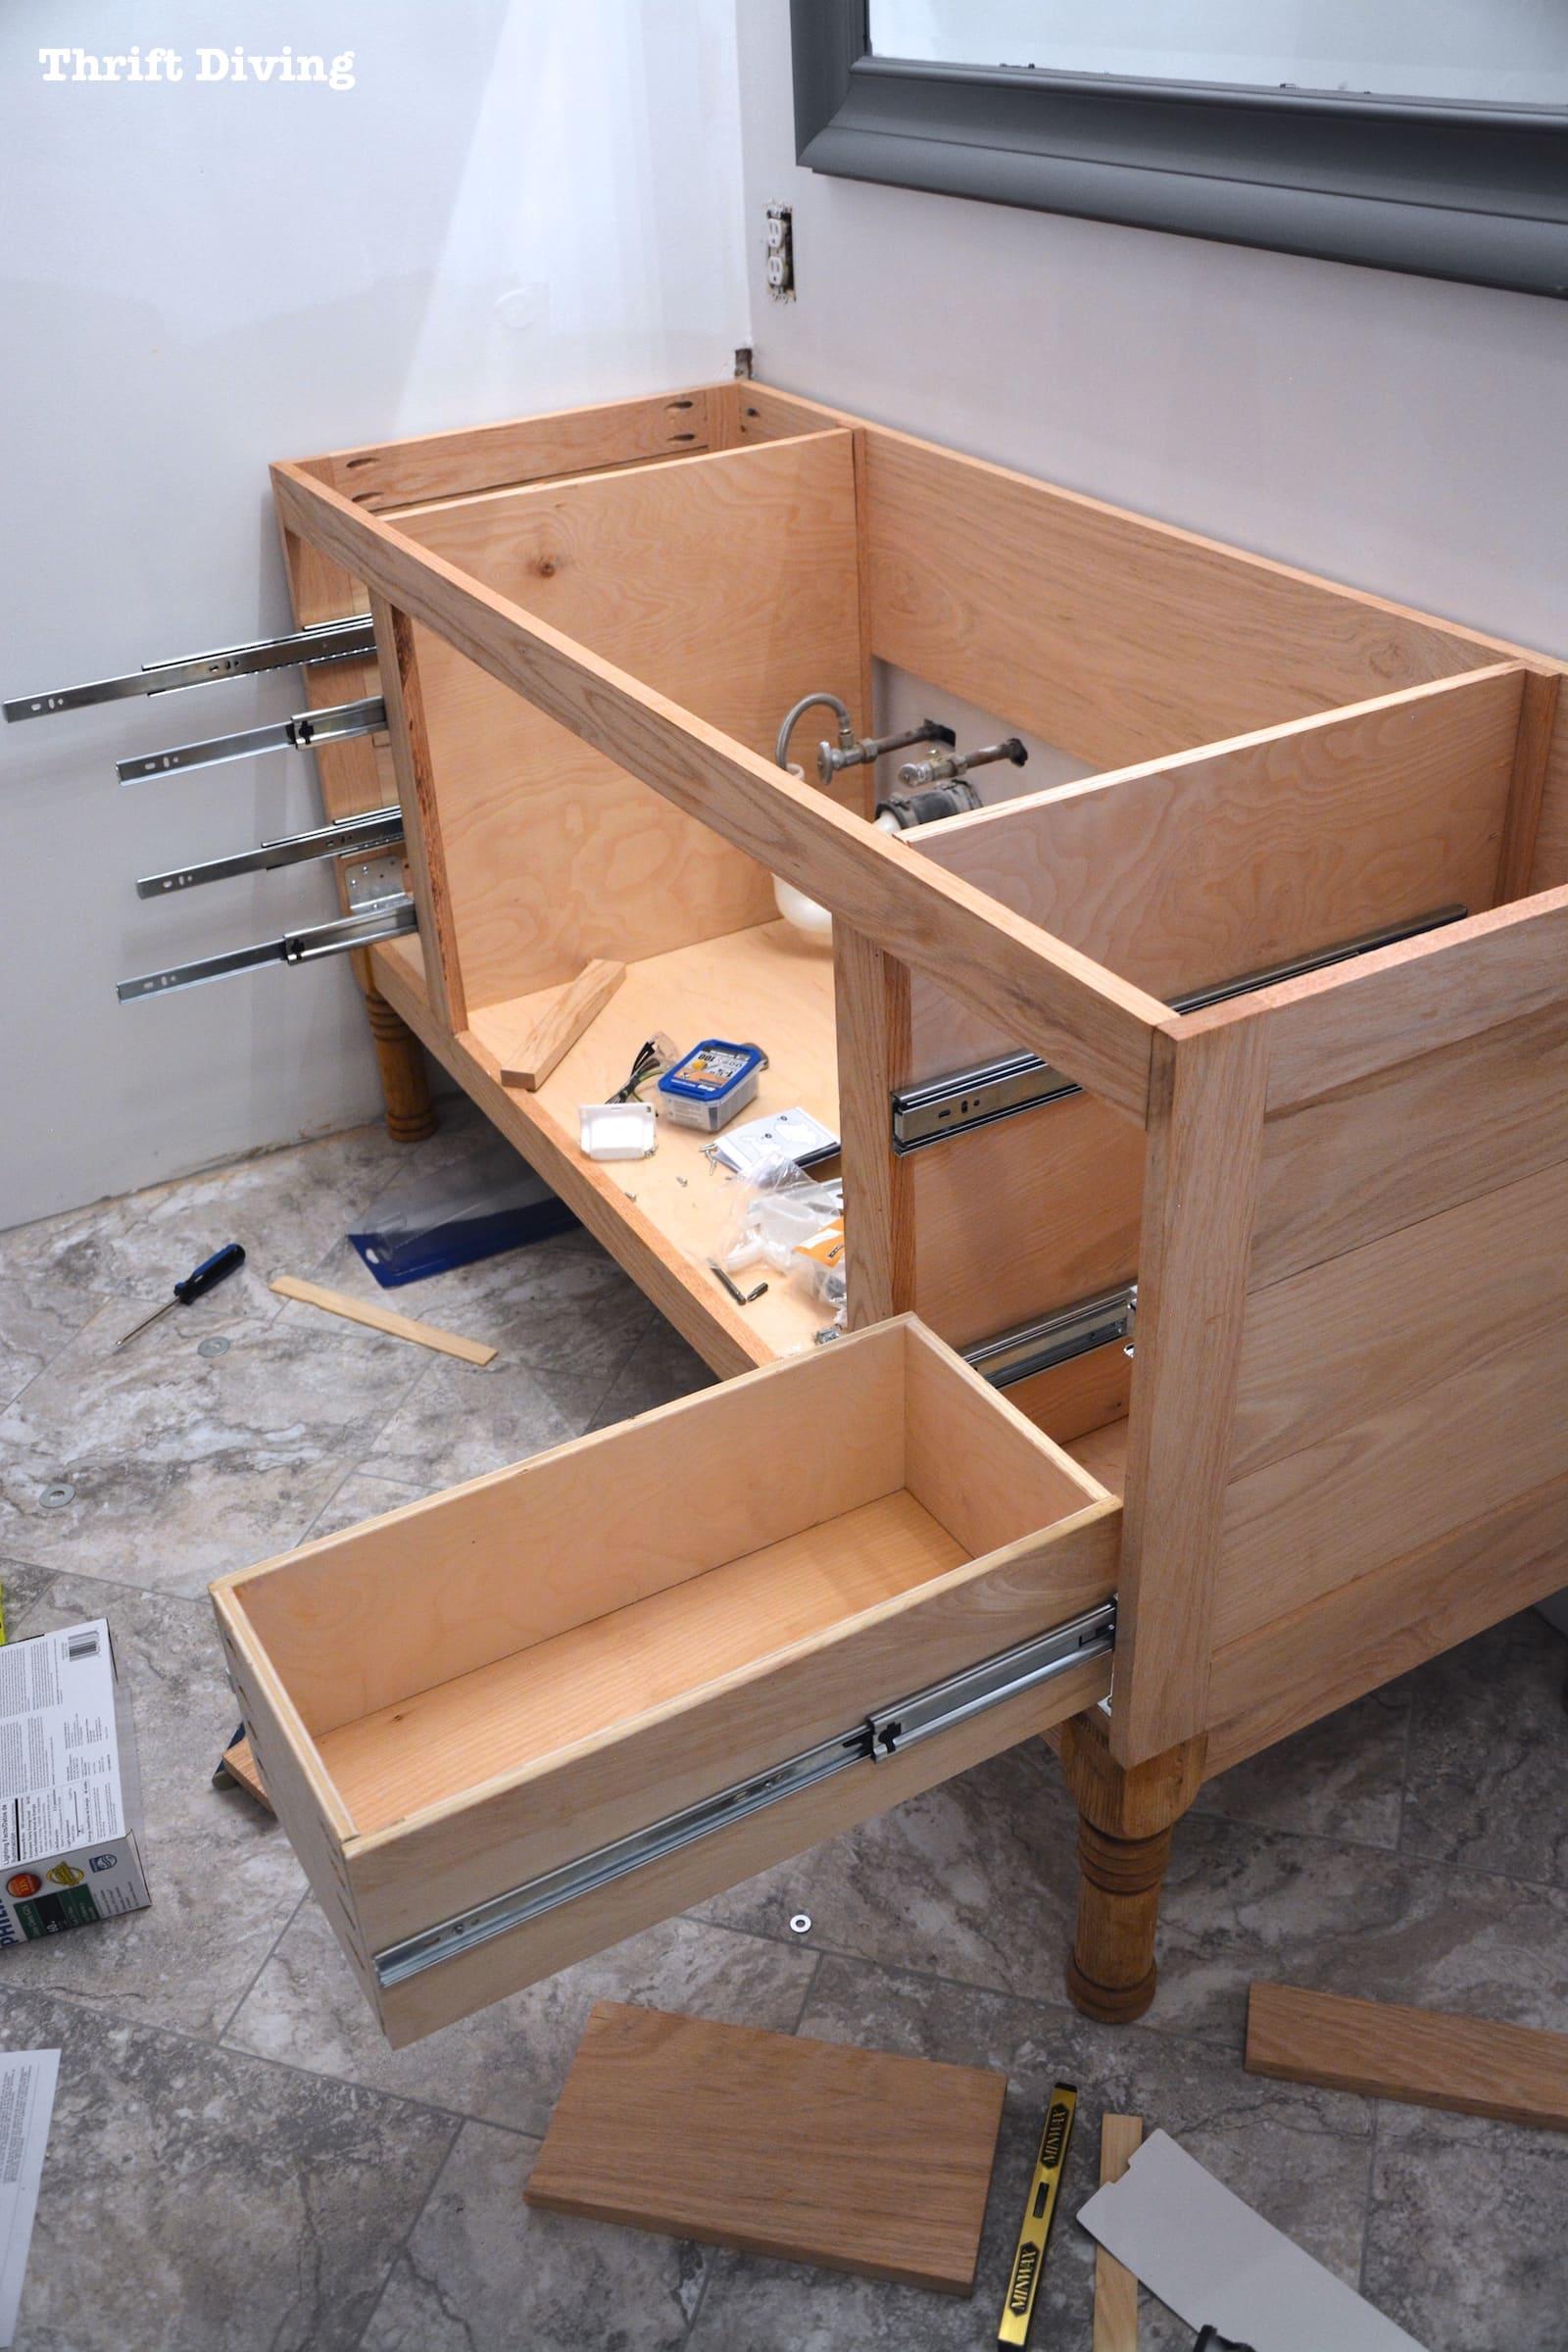 Build A Diy Bathroom Vanity Part 4 Making The Drawers